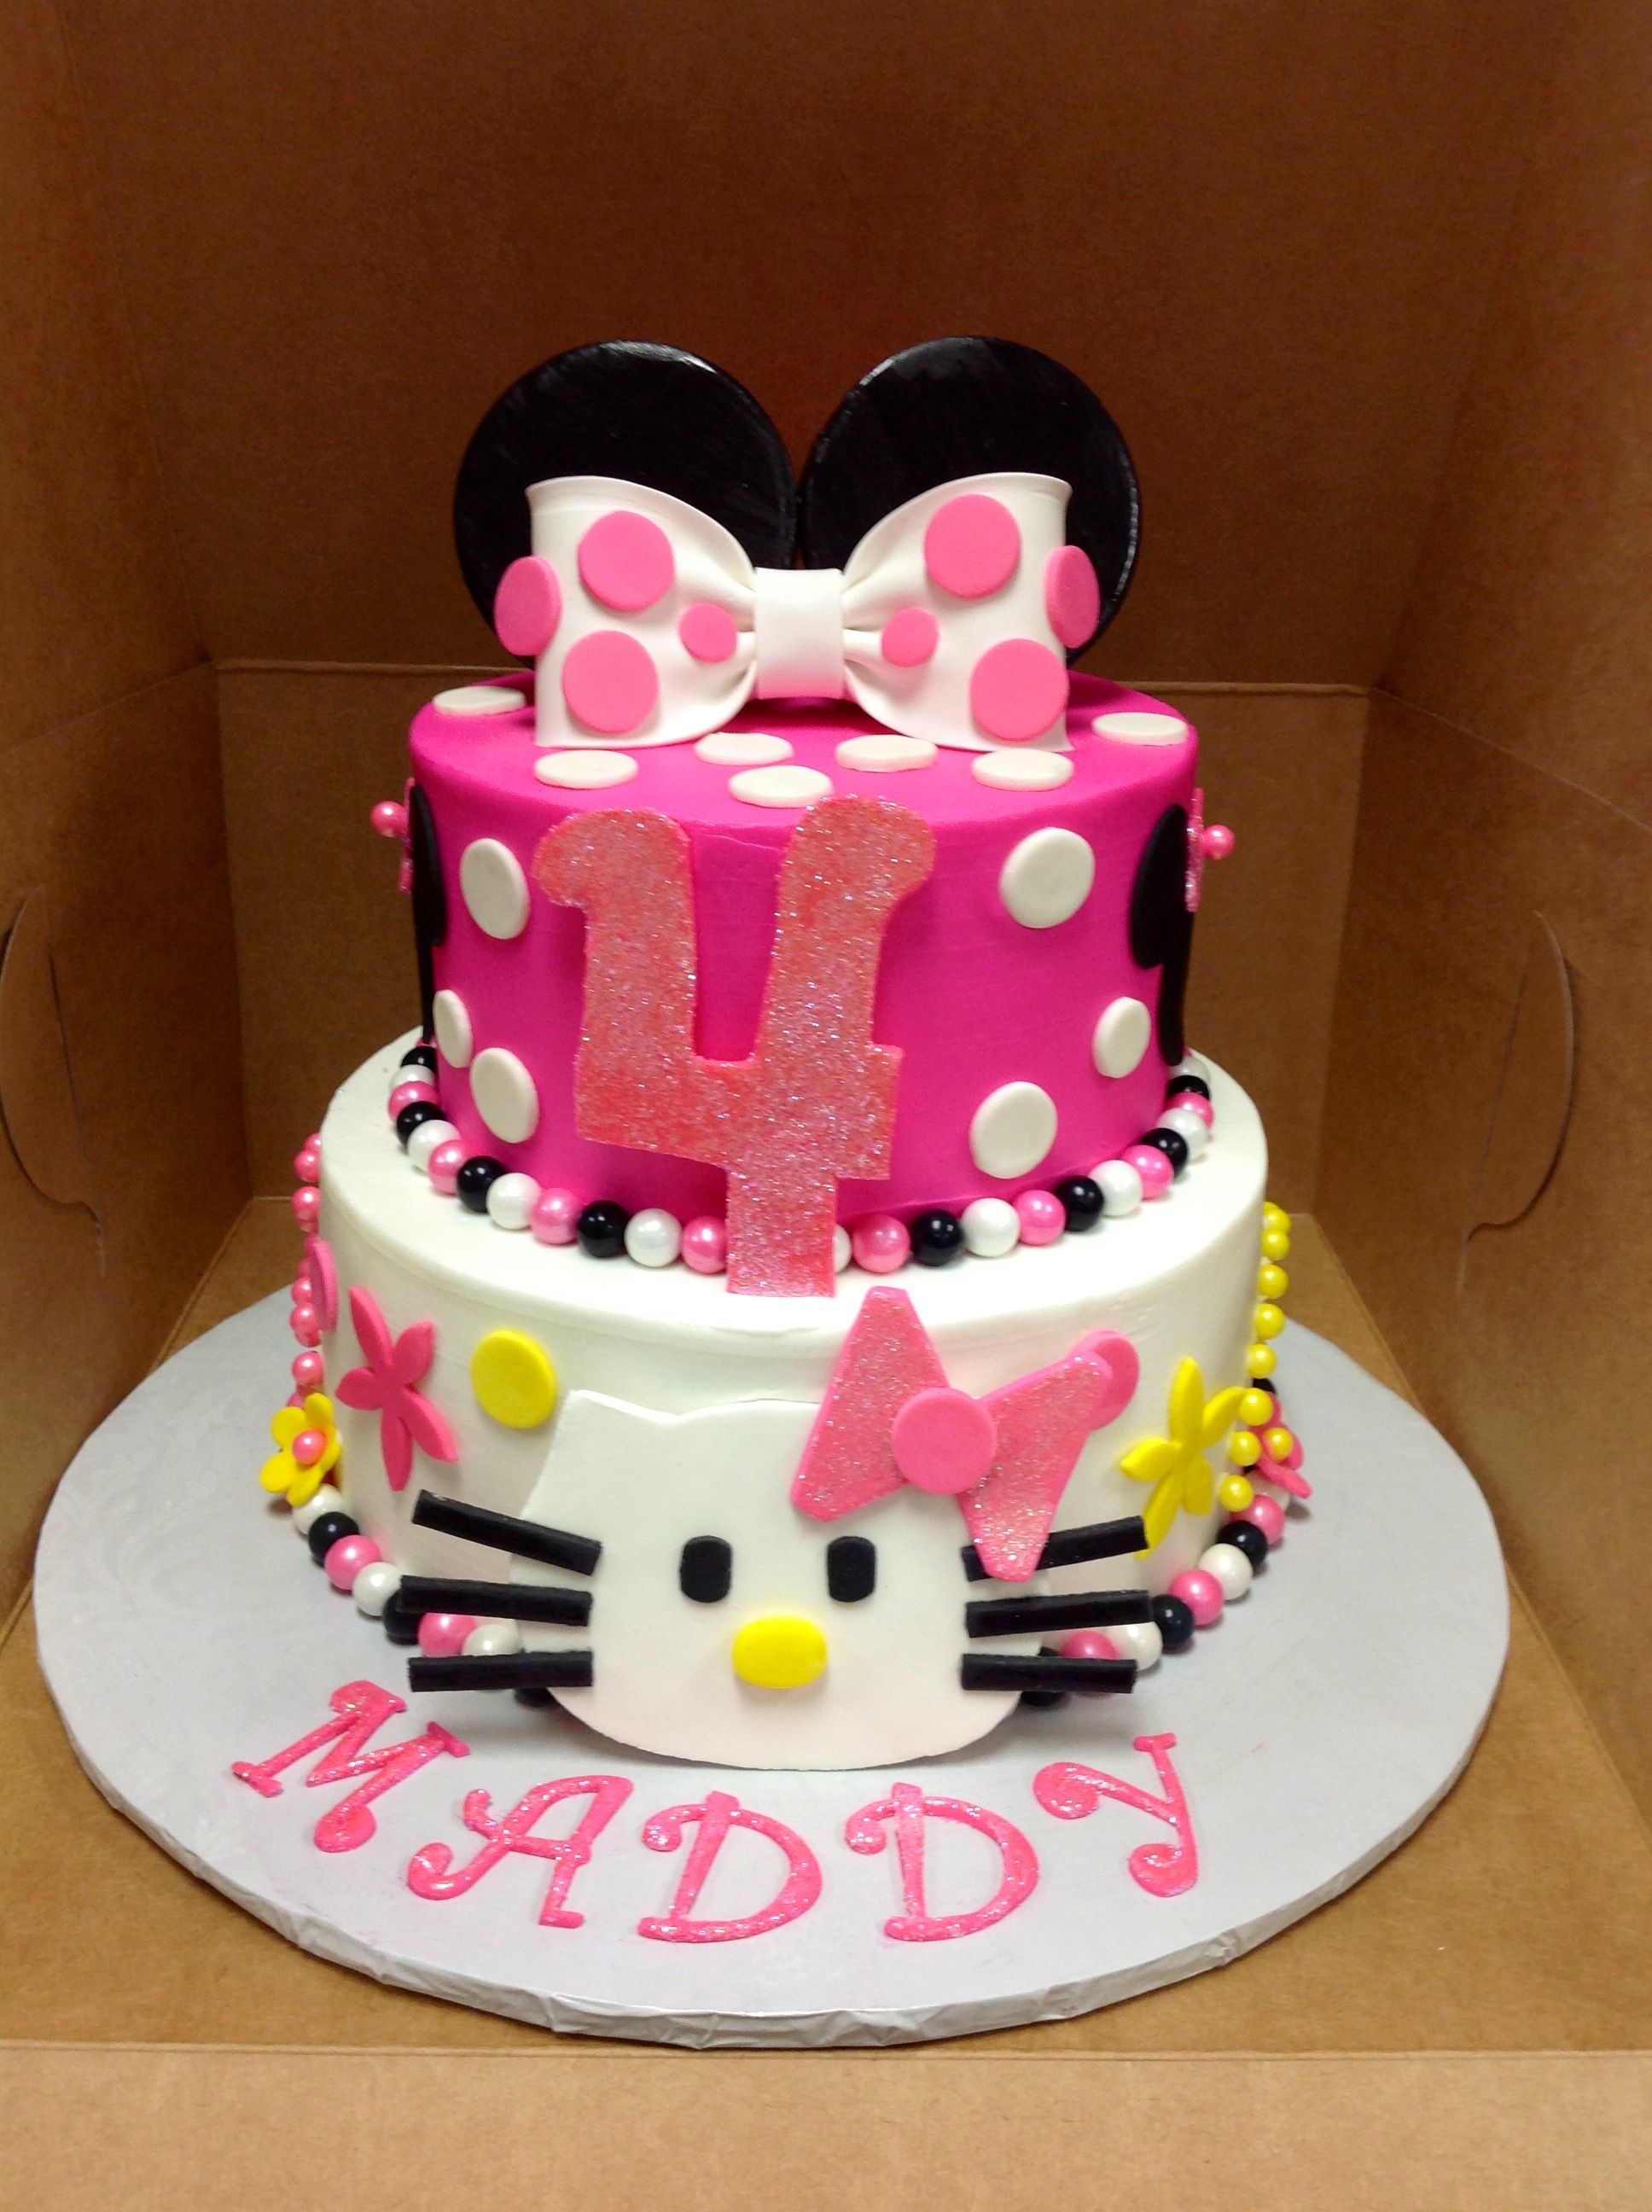 Adam Levine Theme Cakes Pinterest Adam Levine And Cake - Adam levine birthday cake